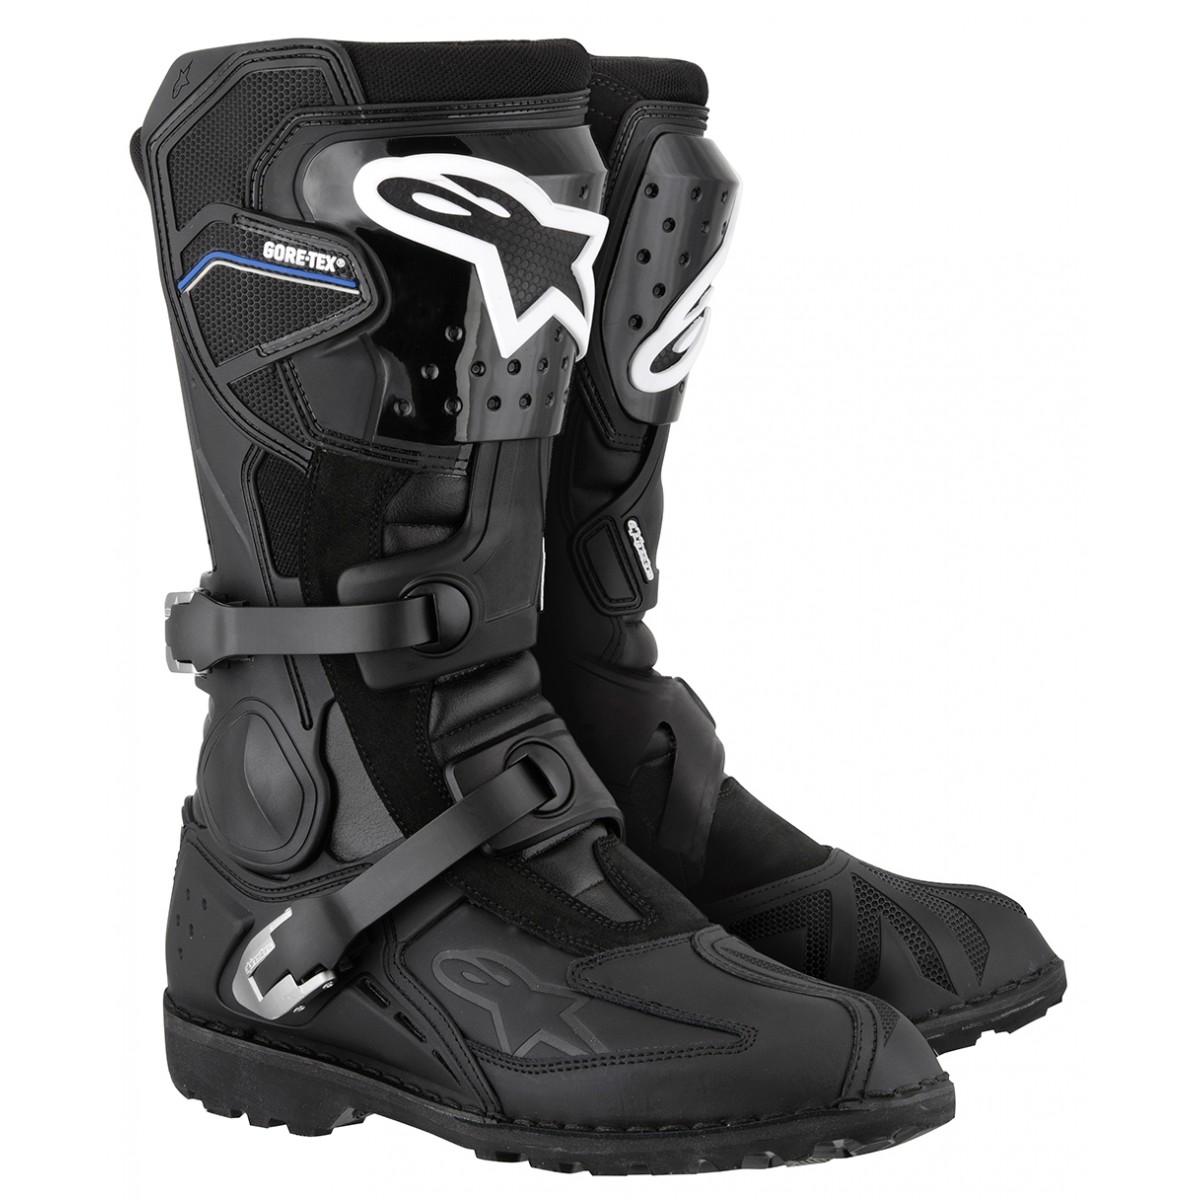 Bota Alpinestars Toucan Gore-Tex® XCR - Impermeável  - Super Bike - Loja Oficial Alpinestars